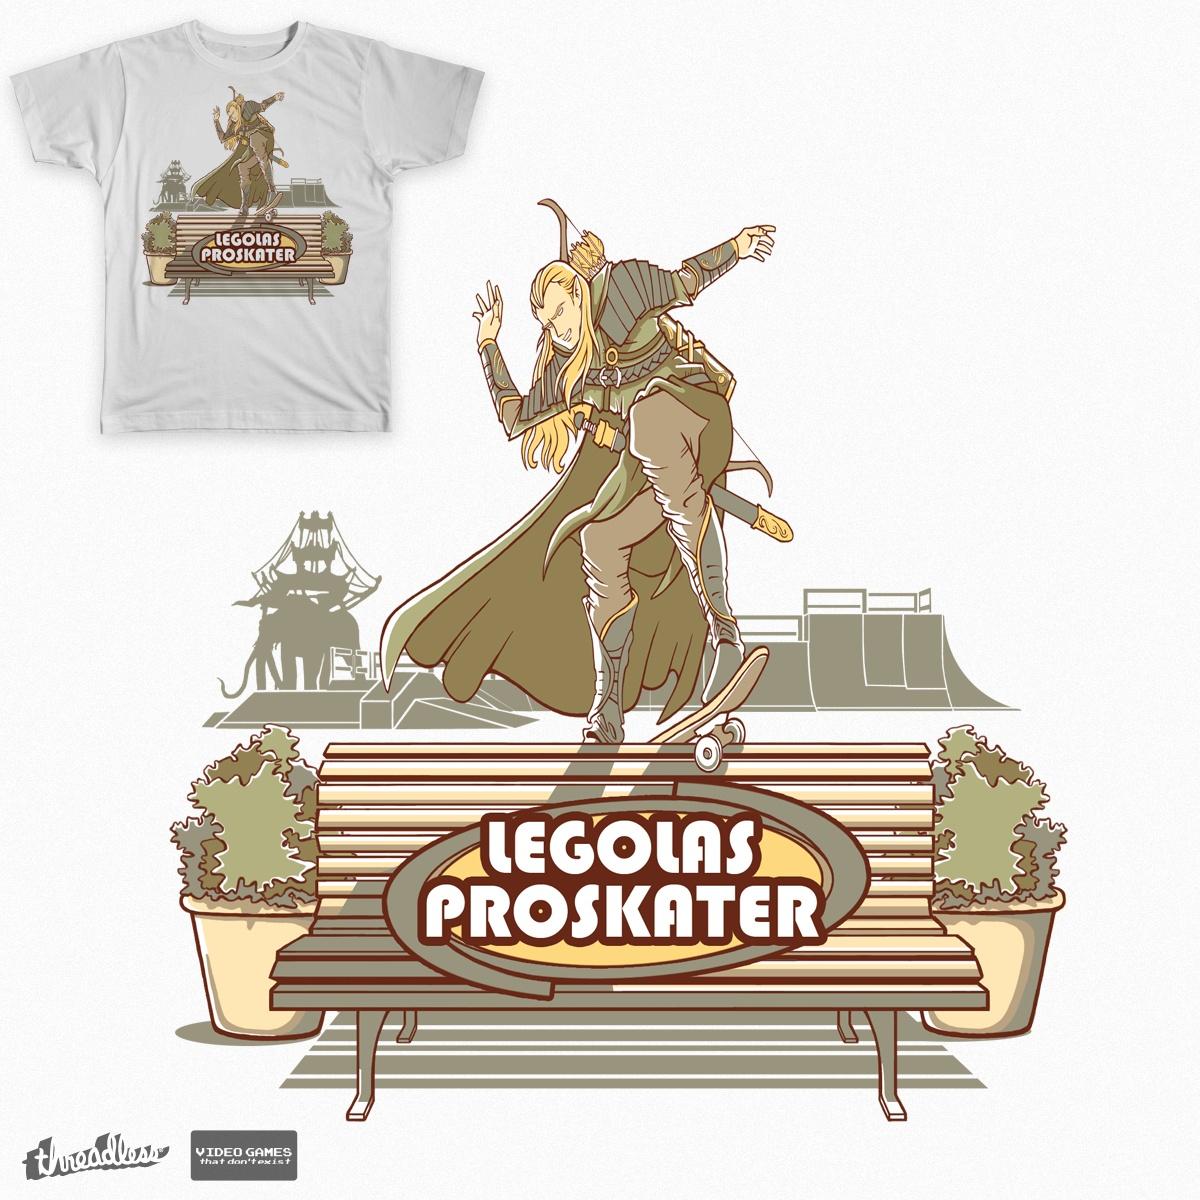 Legolas ProSkater by ferreirabruno on Threadless